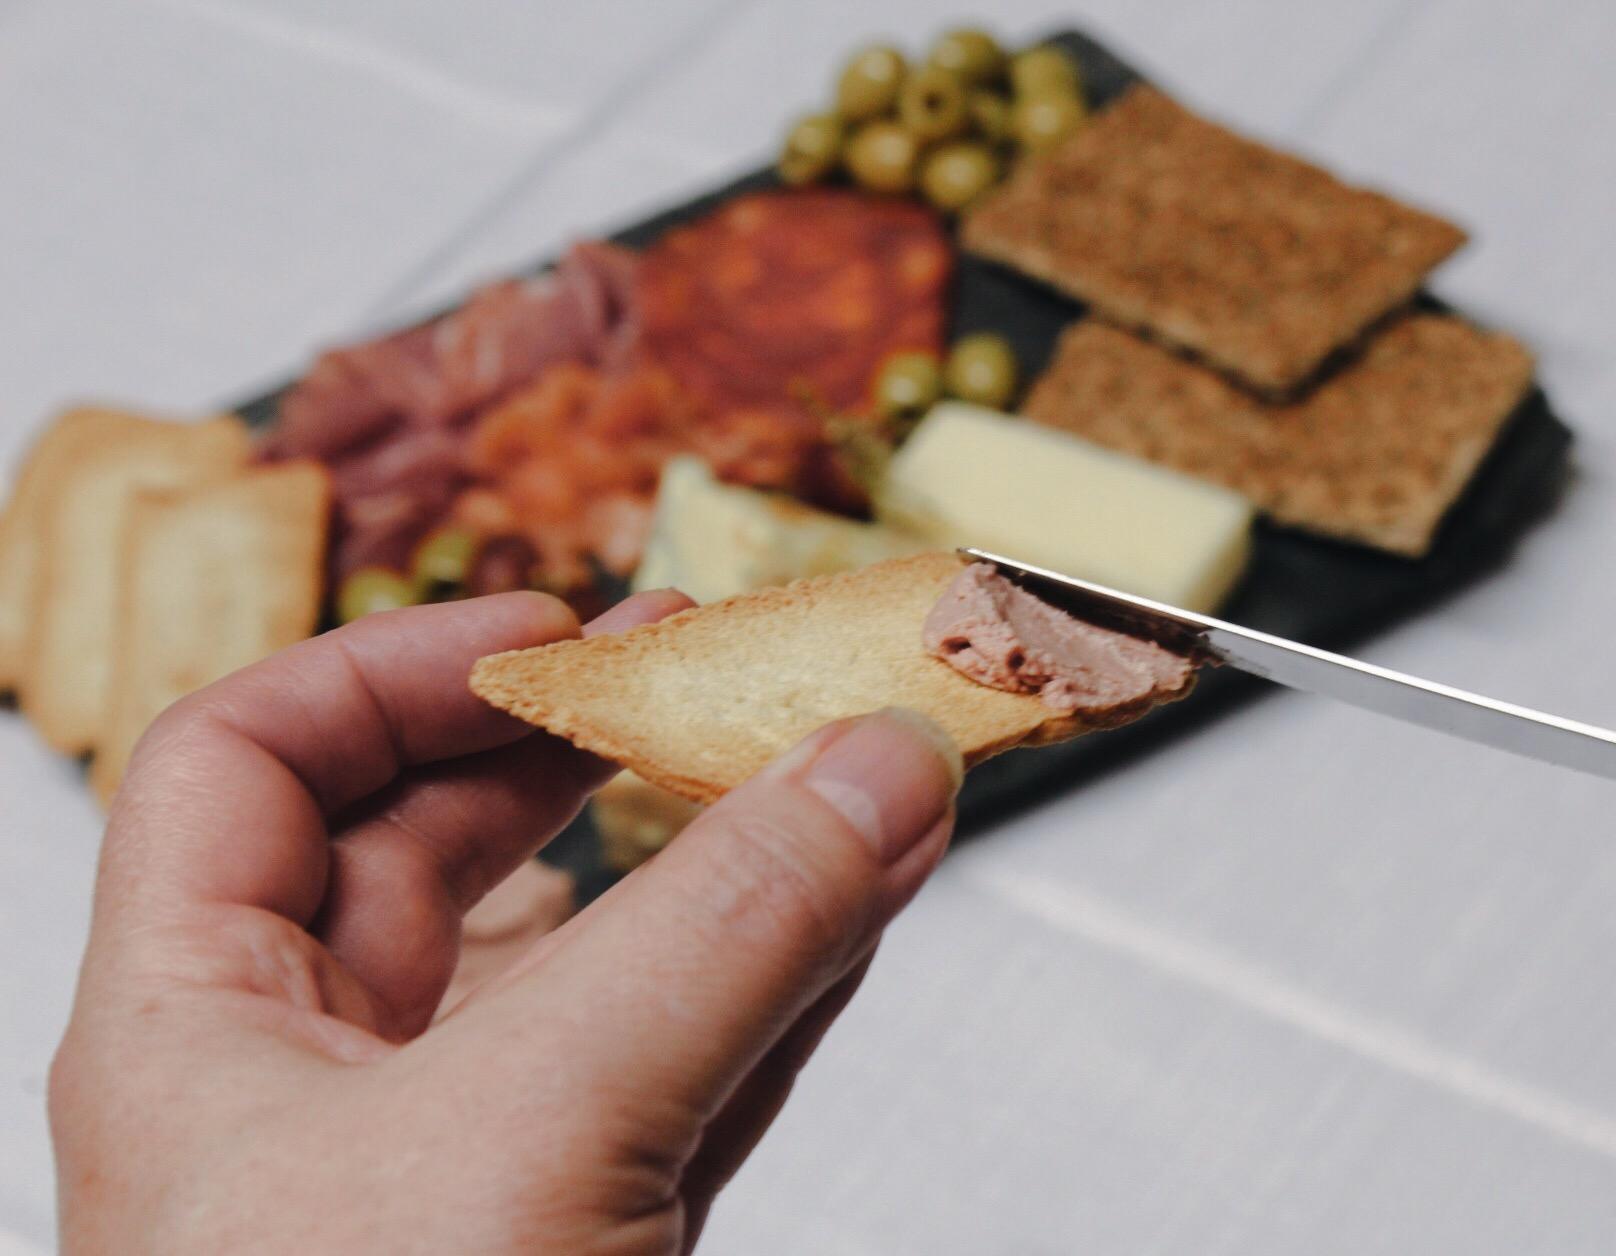 Fine Dining The Swedish Way